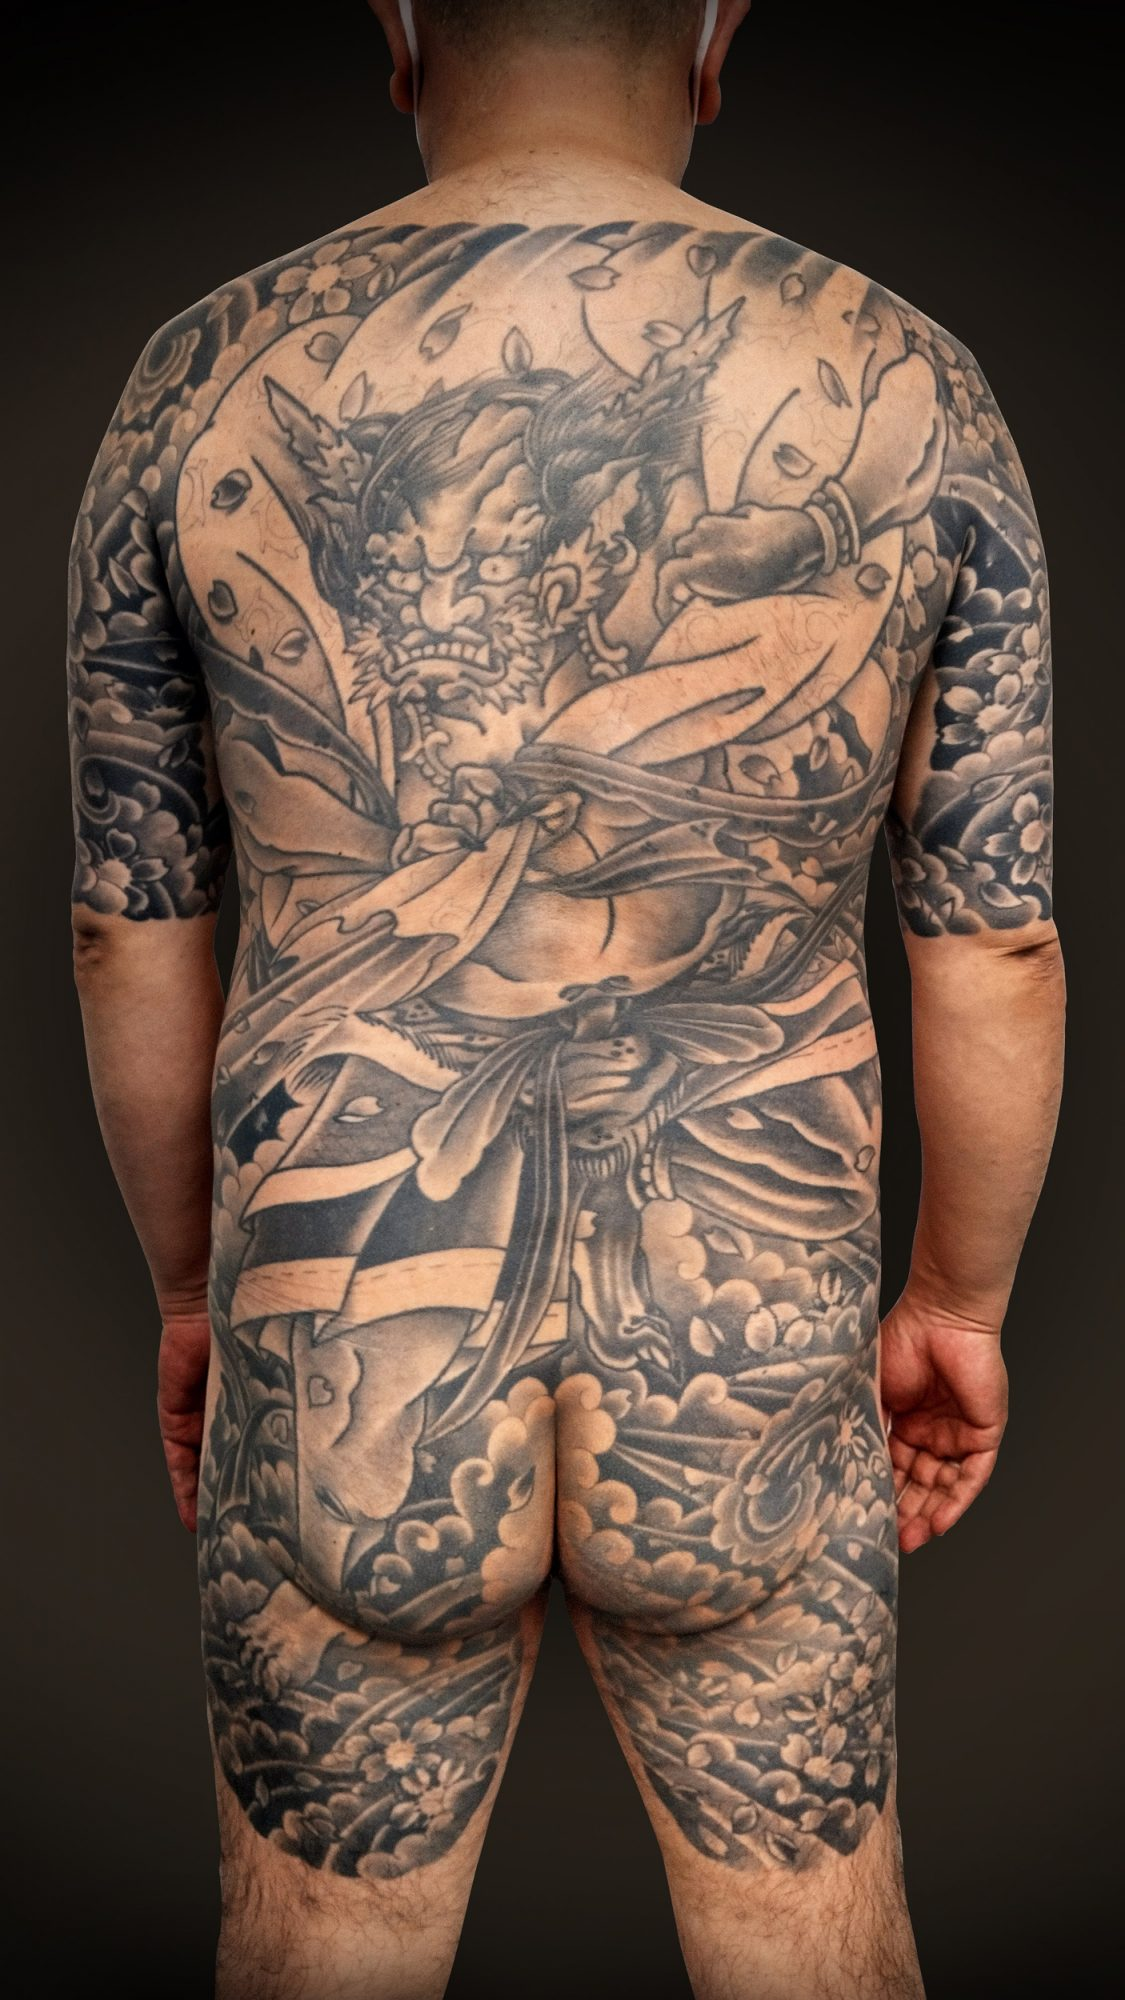 KINGRAT TATTOO 作品 | LAVA gallery | Tattoo artist: Yuji Anai | キングラット | ラバギャラリー | タトゥーアート | 福岡県北九州市 | 20210718_06b